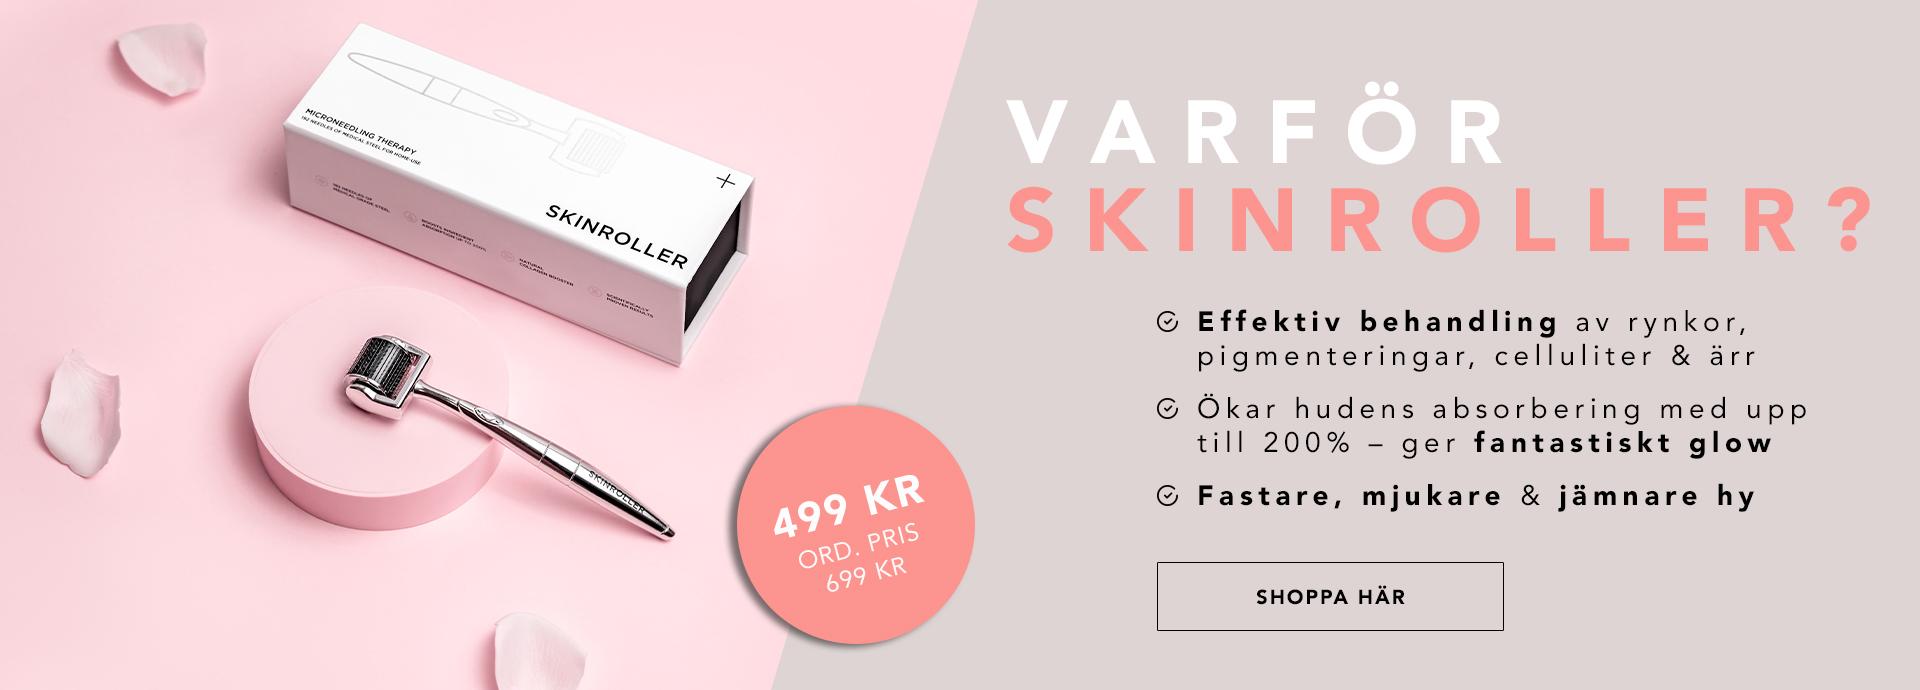 https://www.skinroller.se/image/5354/VALENTINES_v3_start-DESKTOP-silver.jpg